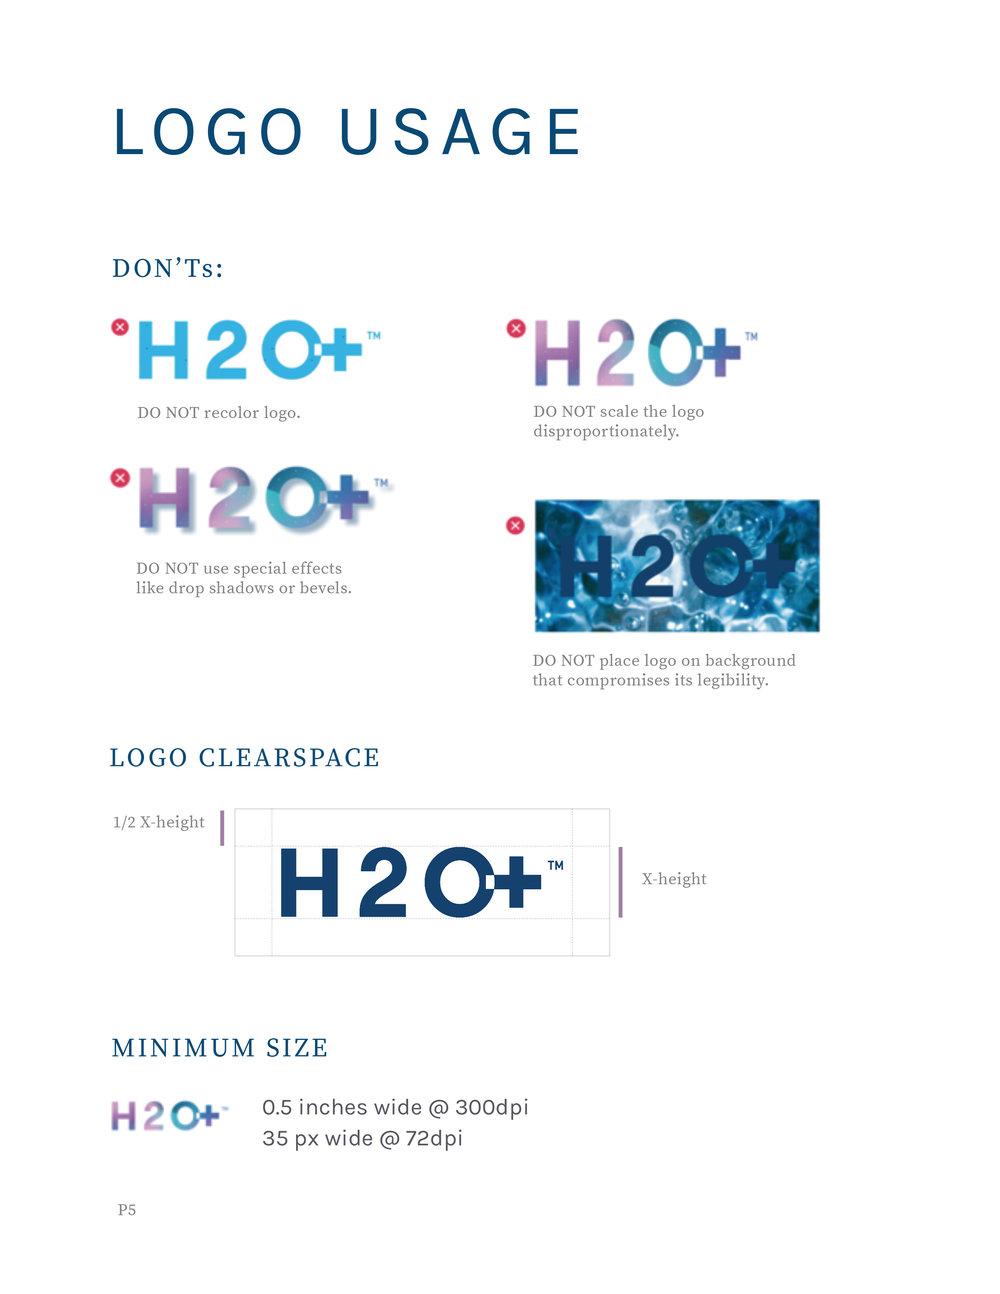 H2O+ Brand Style Guide_0405195.jpg